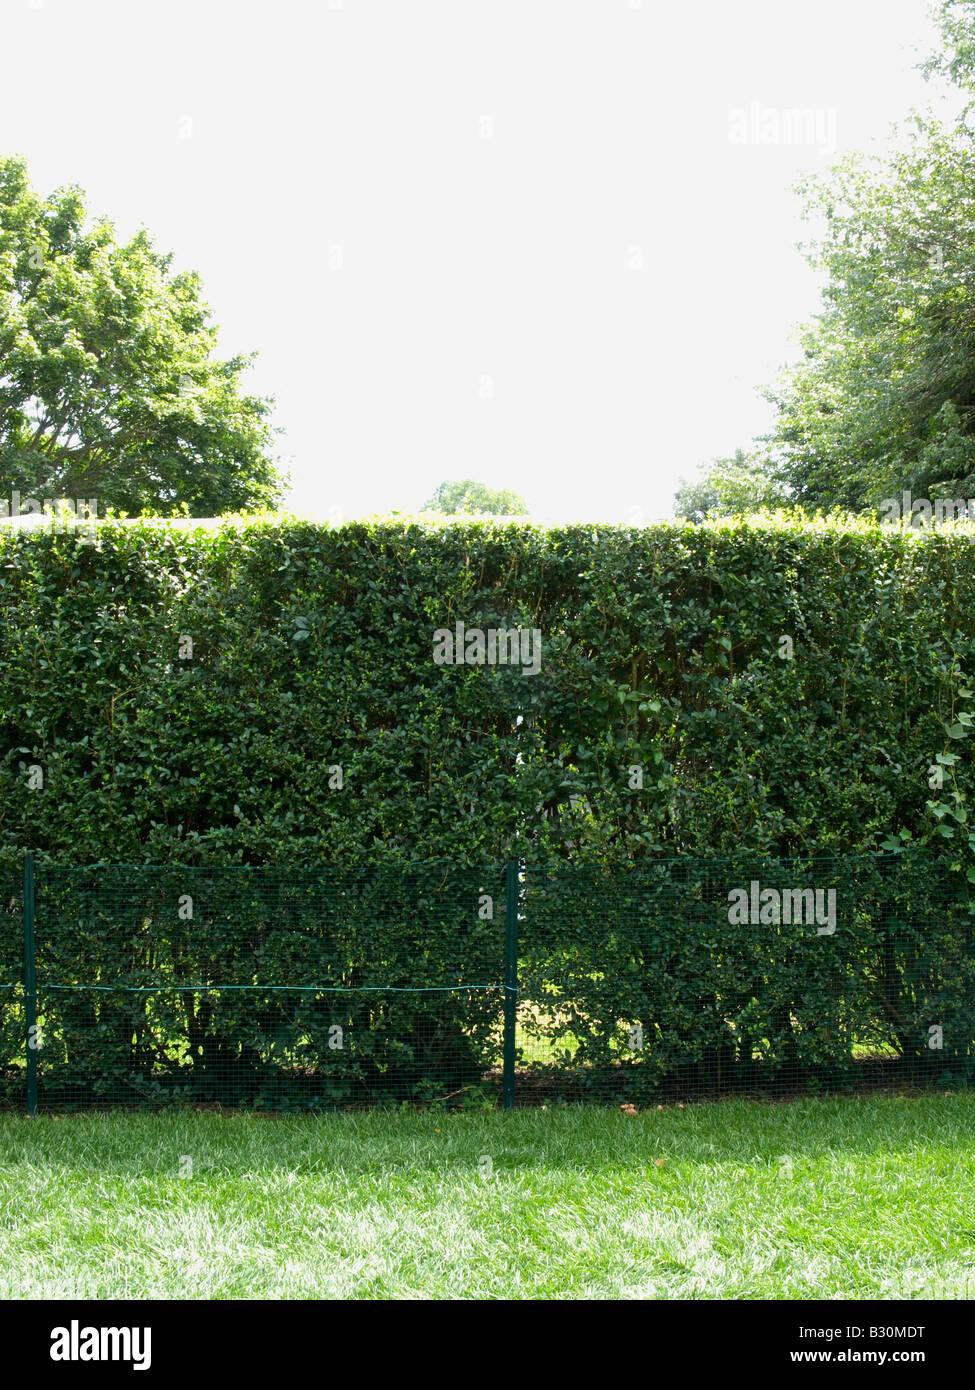 hedgerow - Stock Image